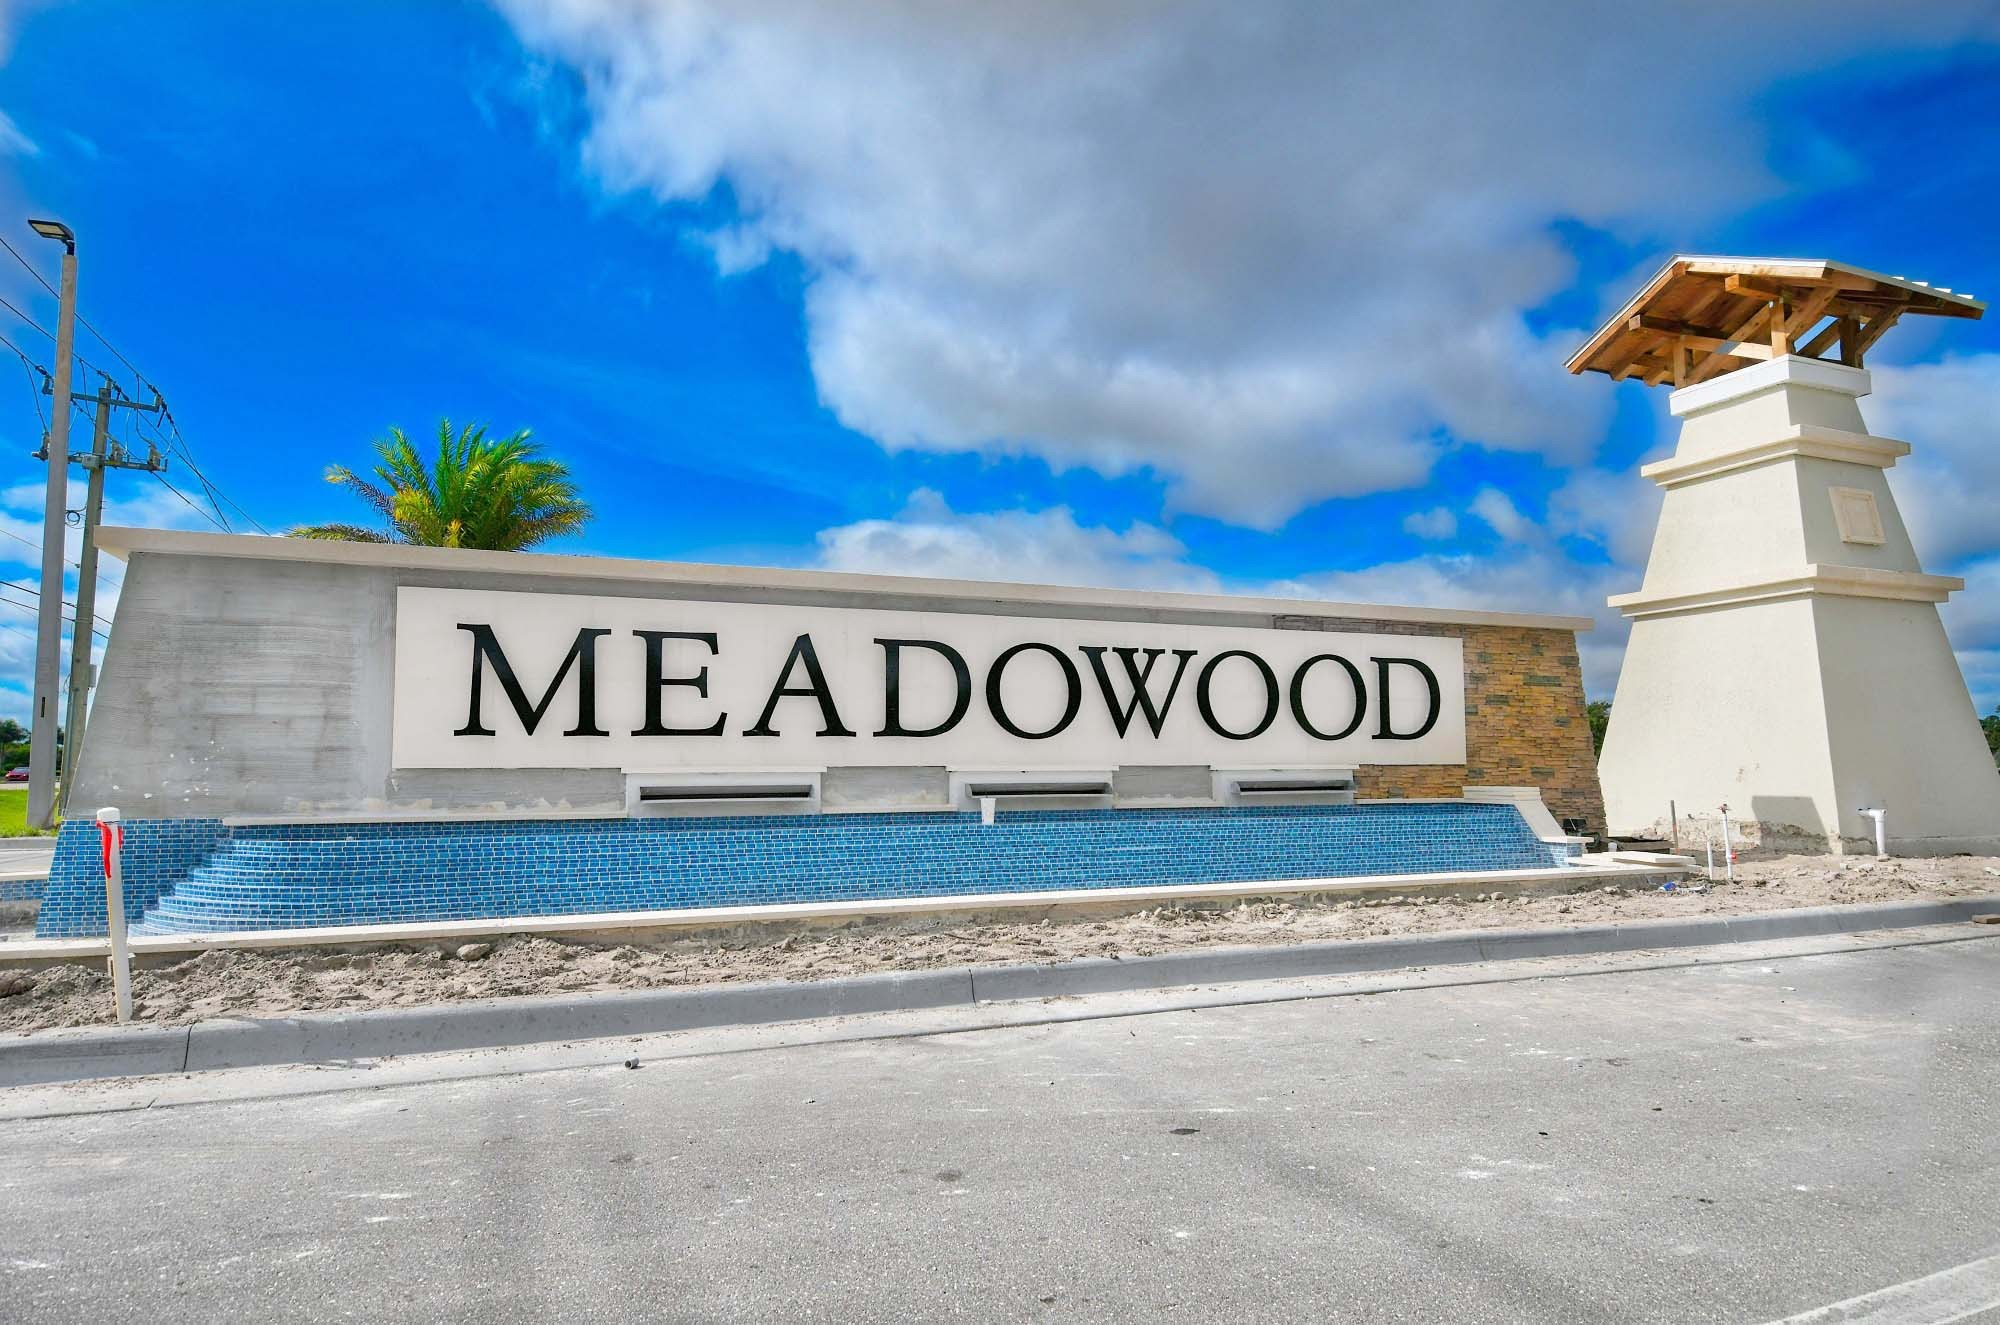 New Community of Meadowood